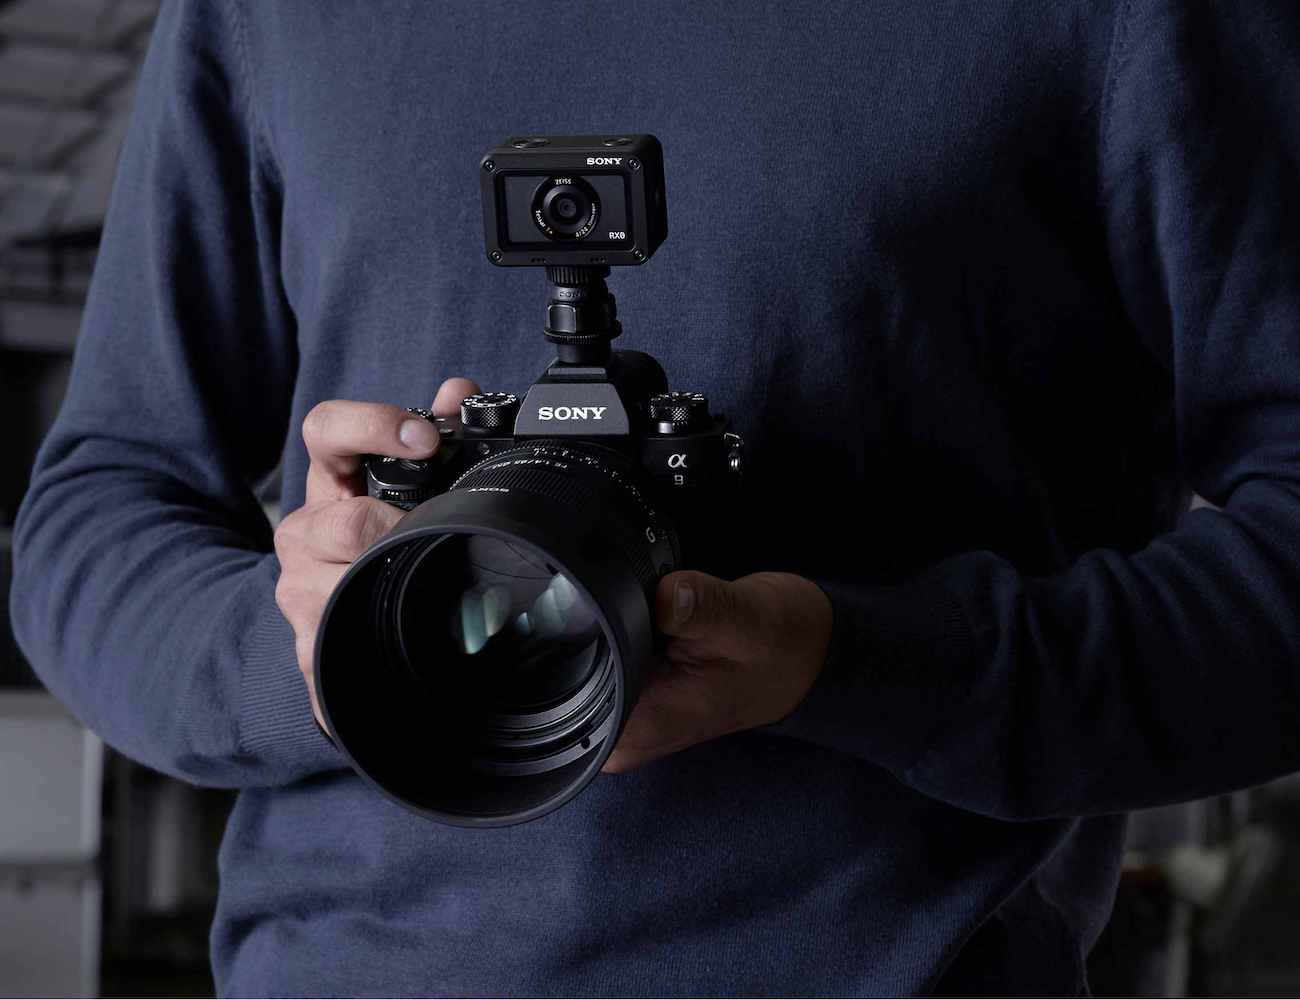 Sony Rx0 Compact Camera